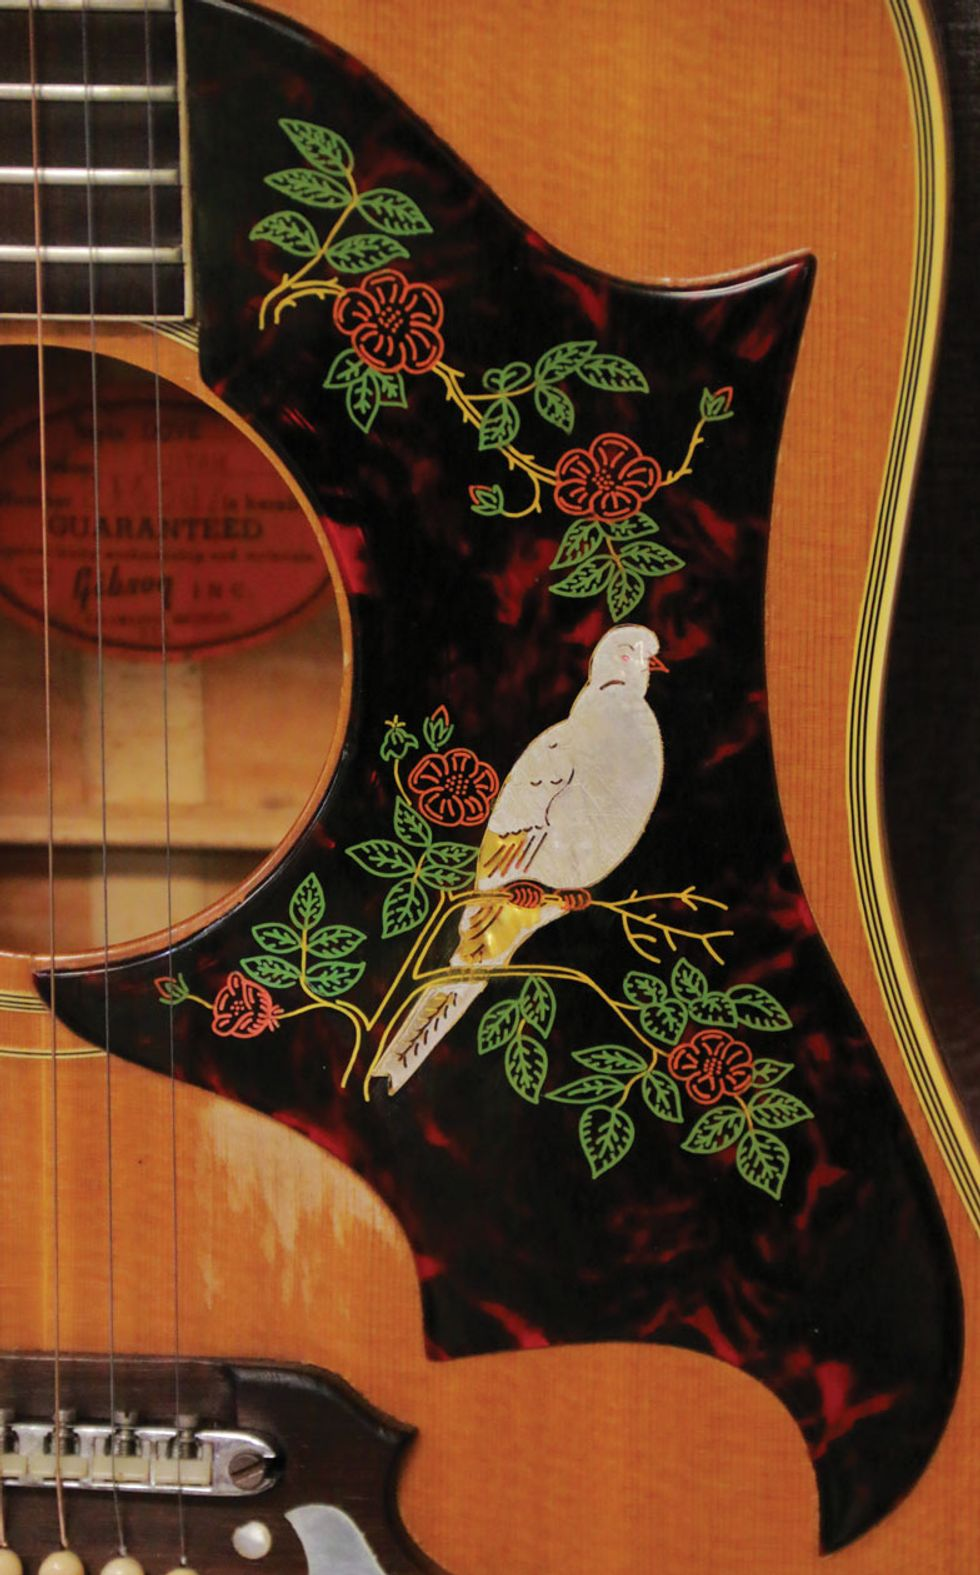 Vintage Vault: 1964 Gibson Dove | Premier Guitar